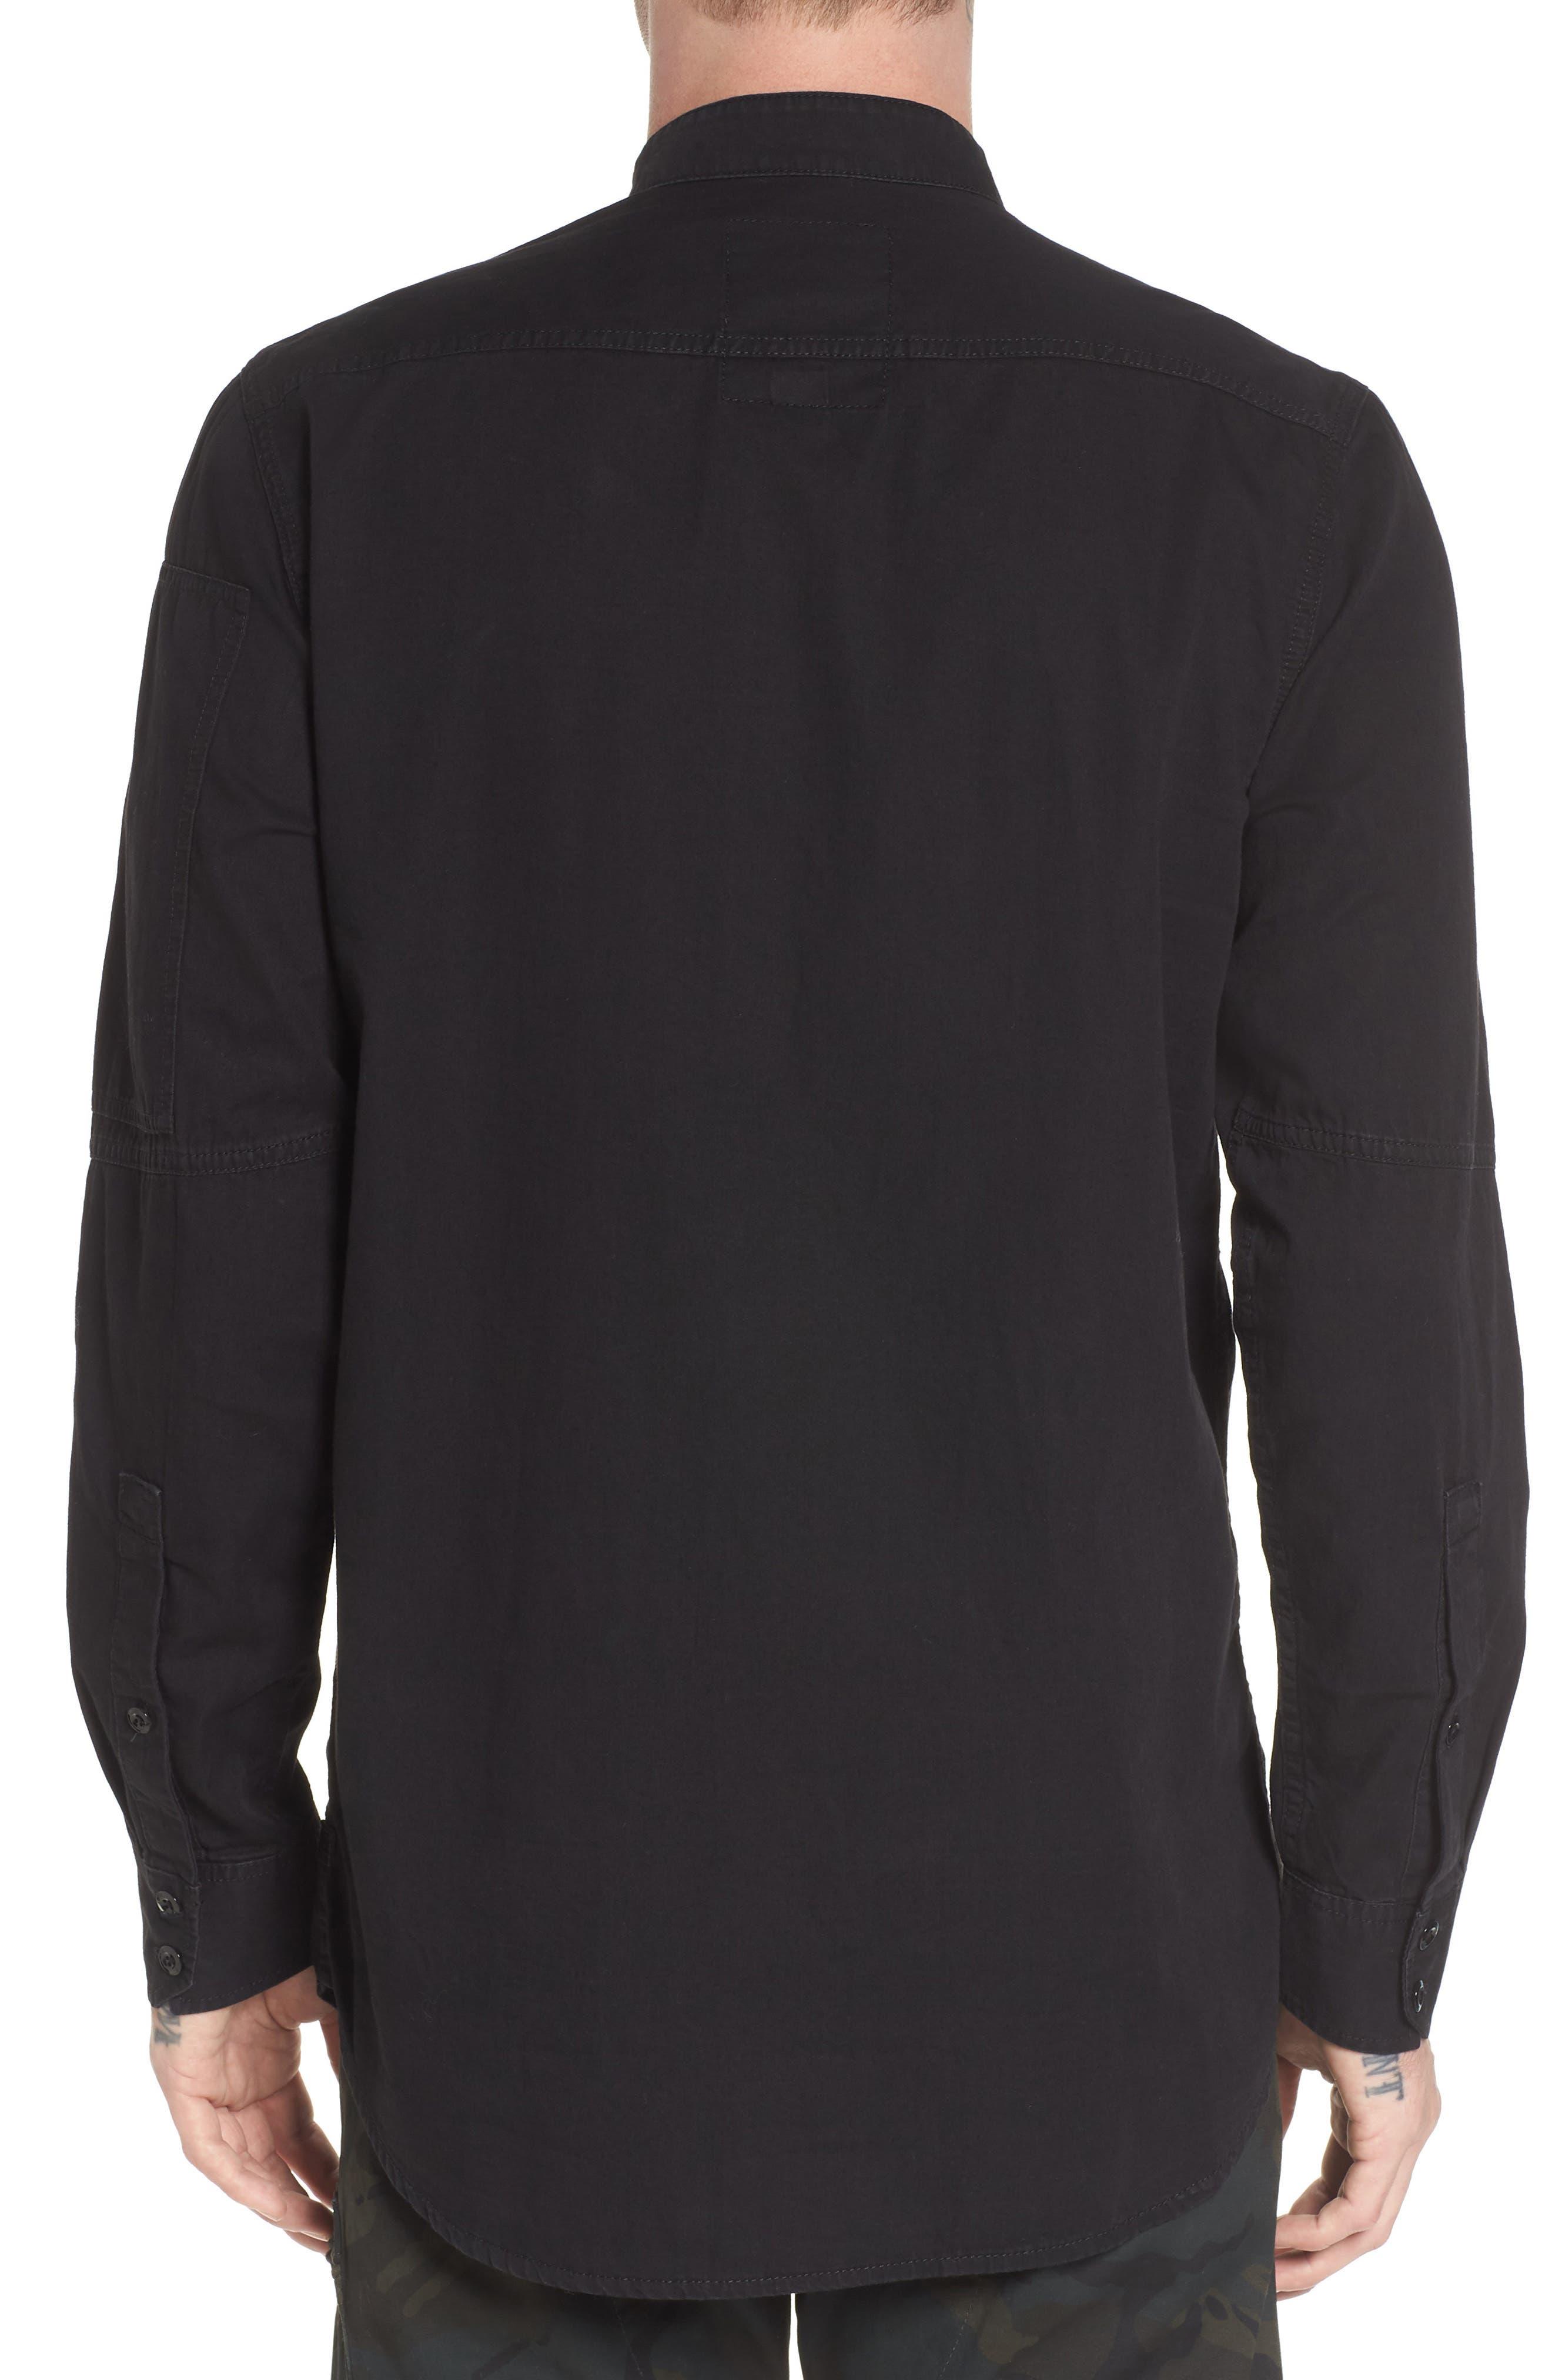 Stalt C-Less Shirt,                             Alternate thumbnail 2, color,                             001